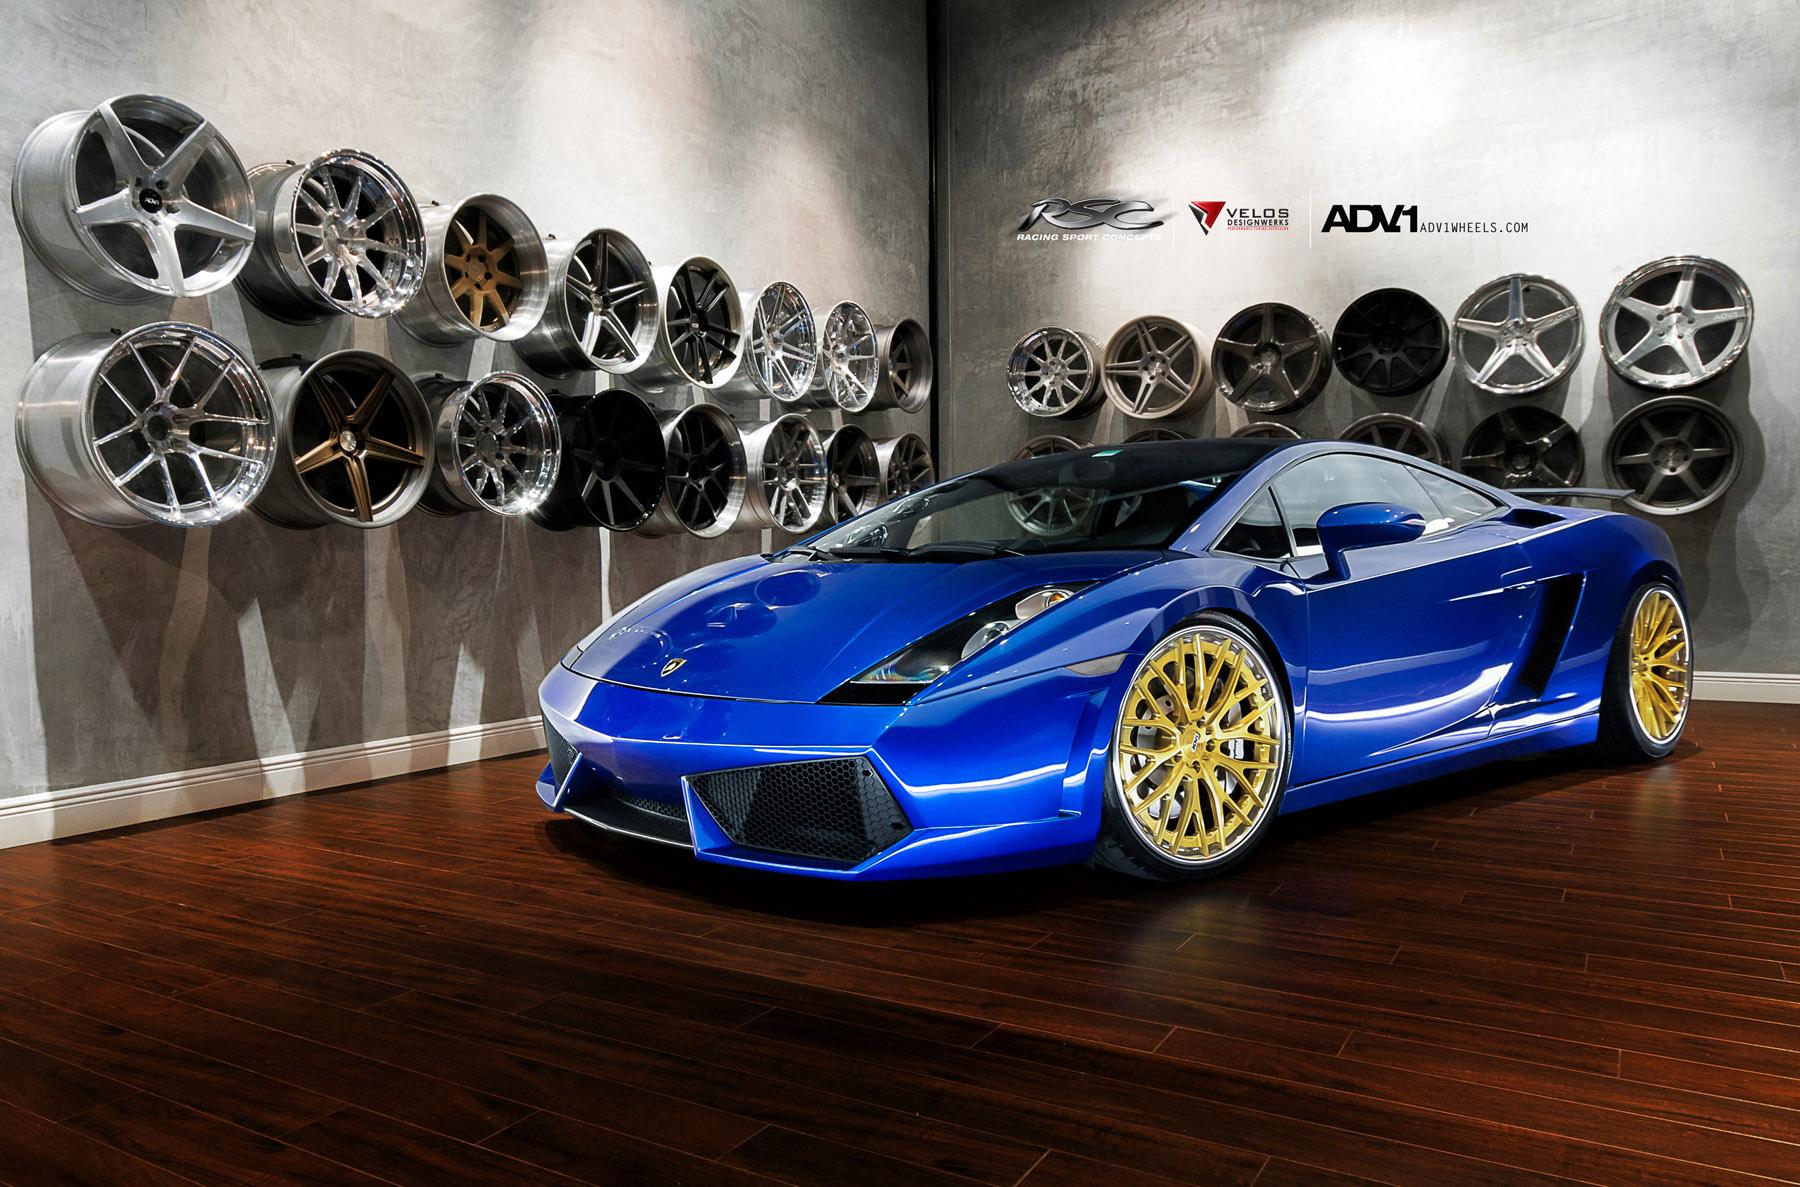 ADV.1 колеса Lamborghini Gallardo ADV10.0TS SL Gold Edition  - фотография №4